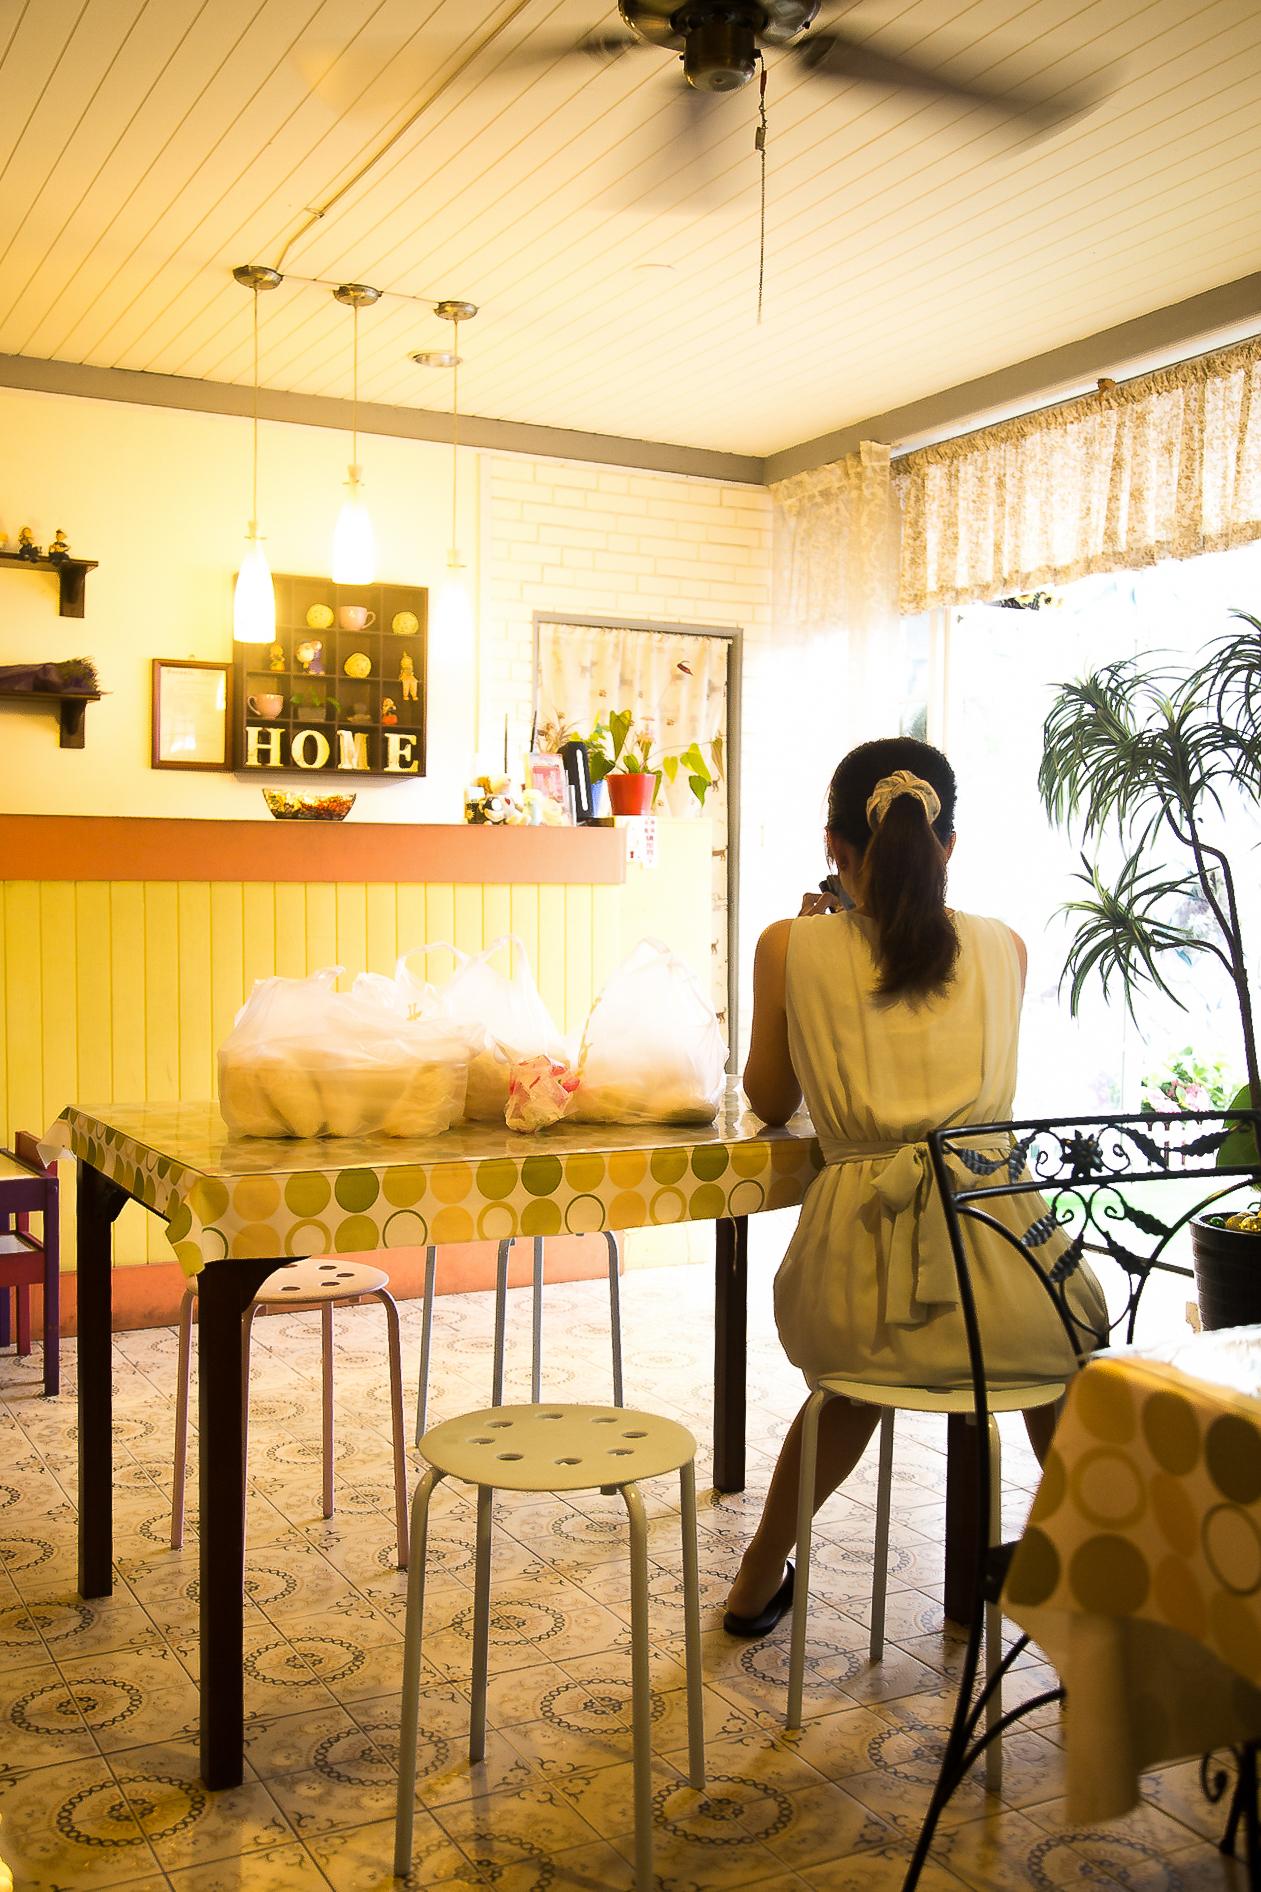 Wedding-婚攝Q比-酷比攝CUBY-PHOTOGRAPHY-宜蘭金樽喜慶宴會廣場-02